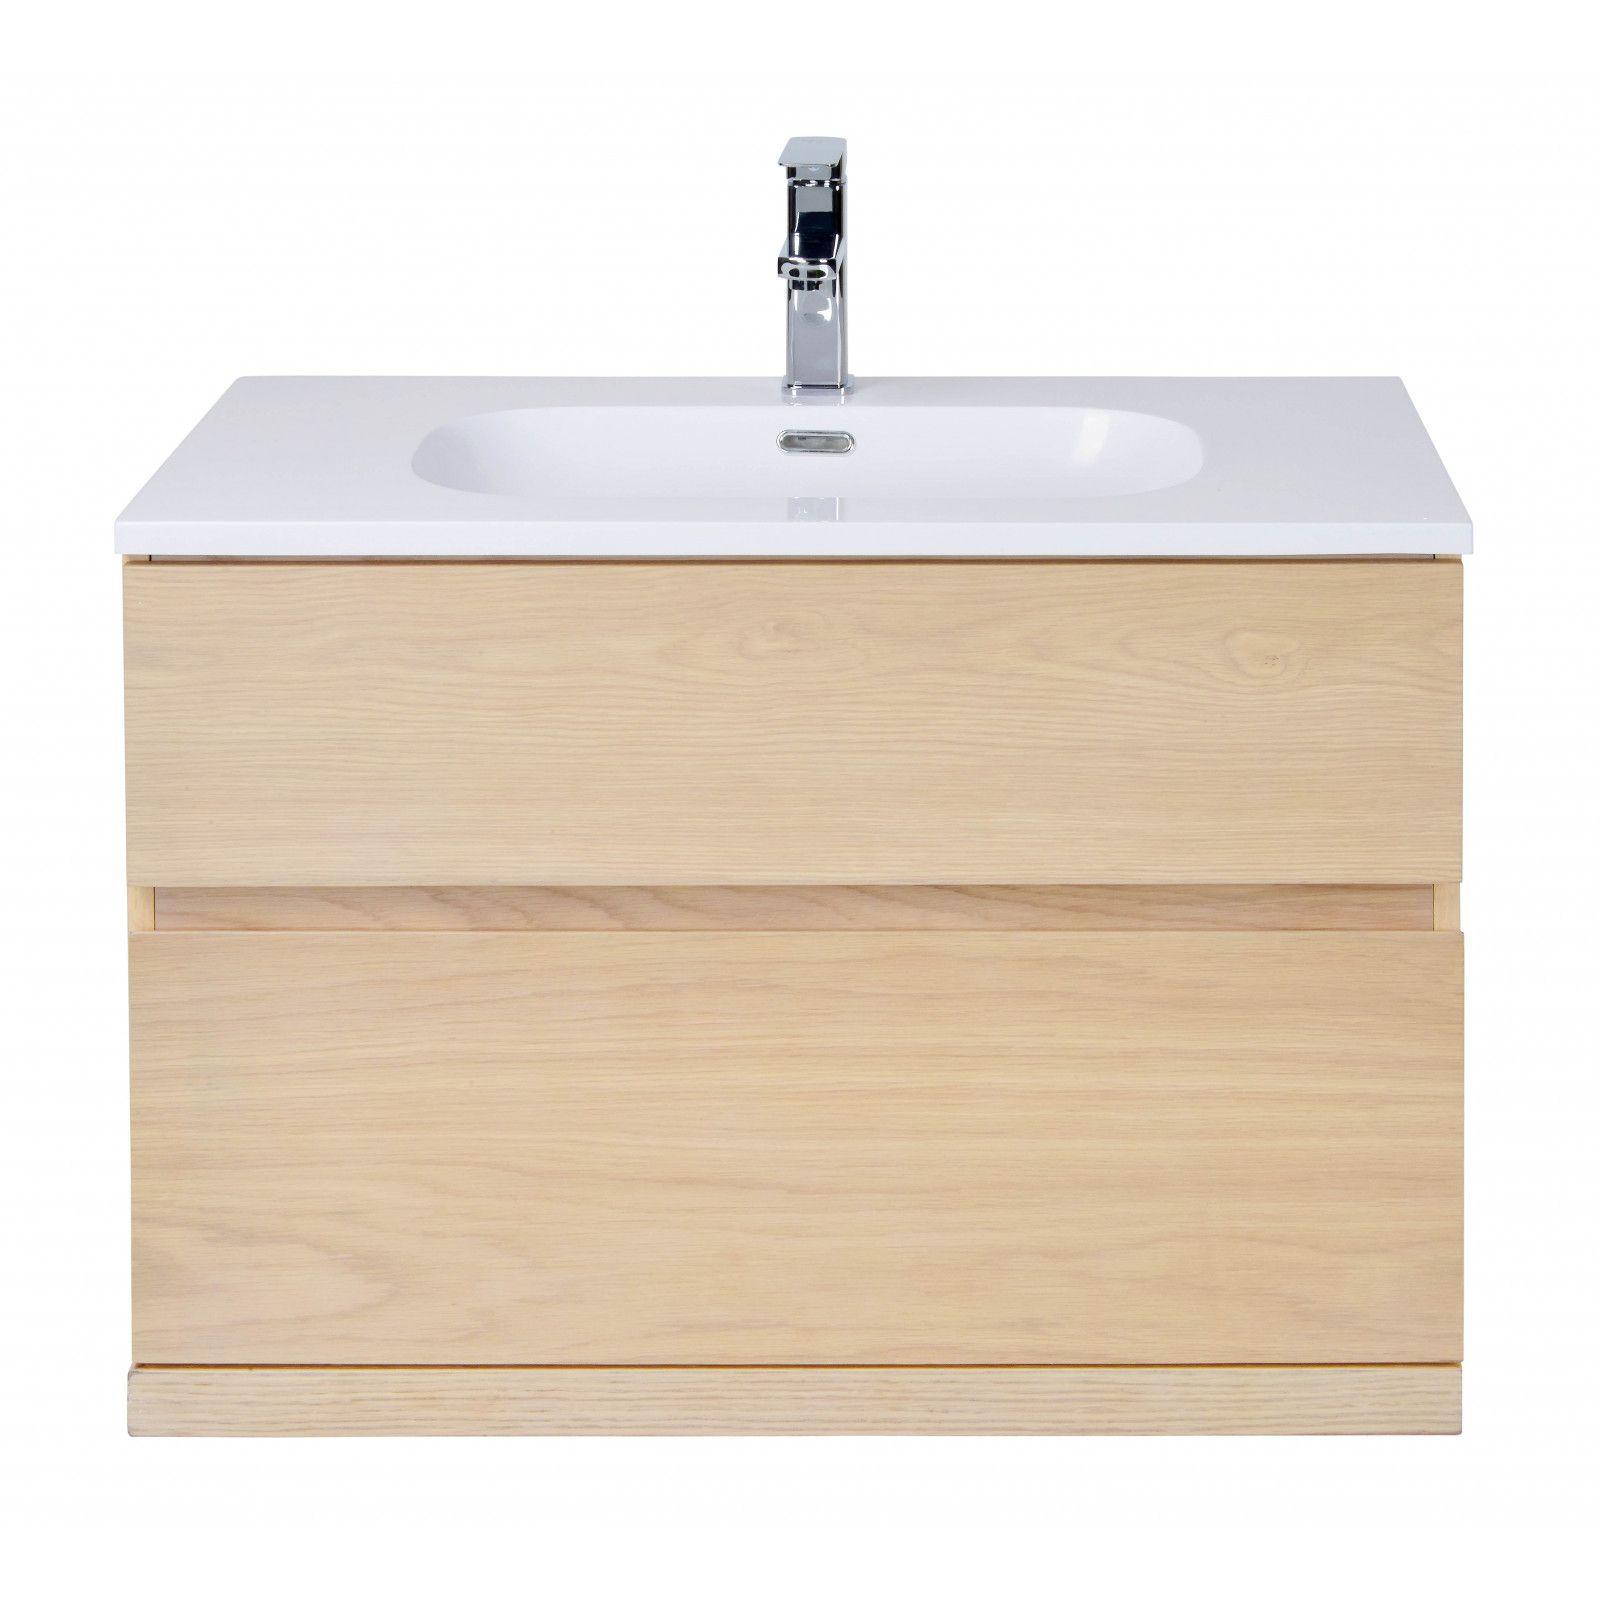 Ensemble salle de bain chêne 80 cm meuble + vasque + miroir + demi-colonne ENIO